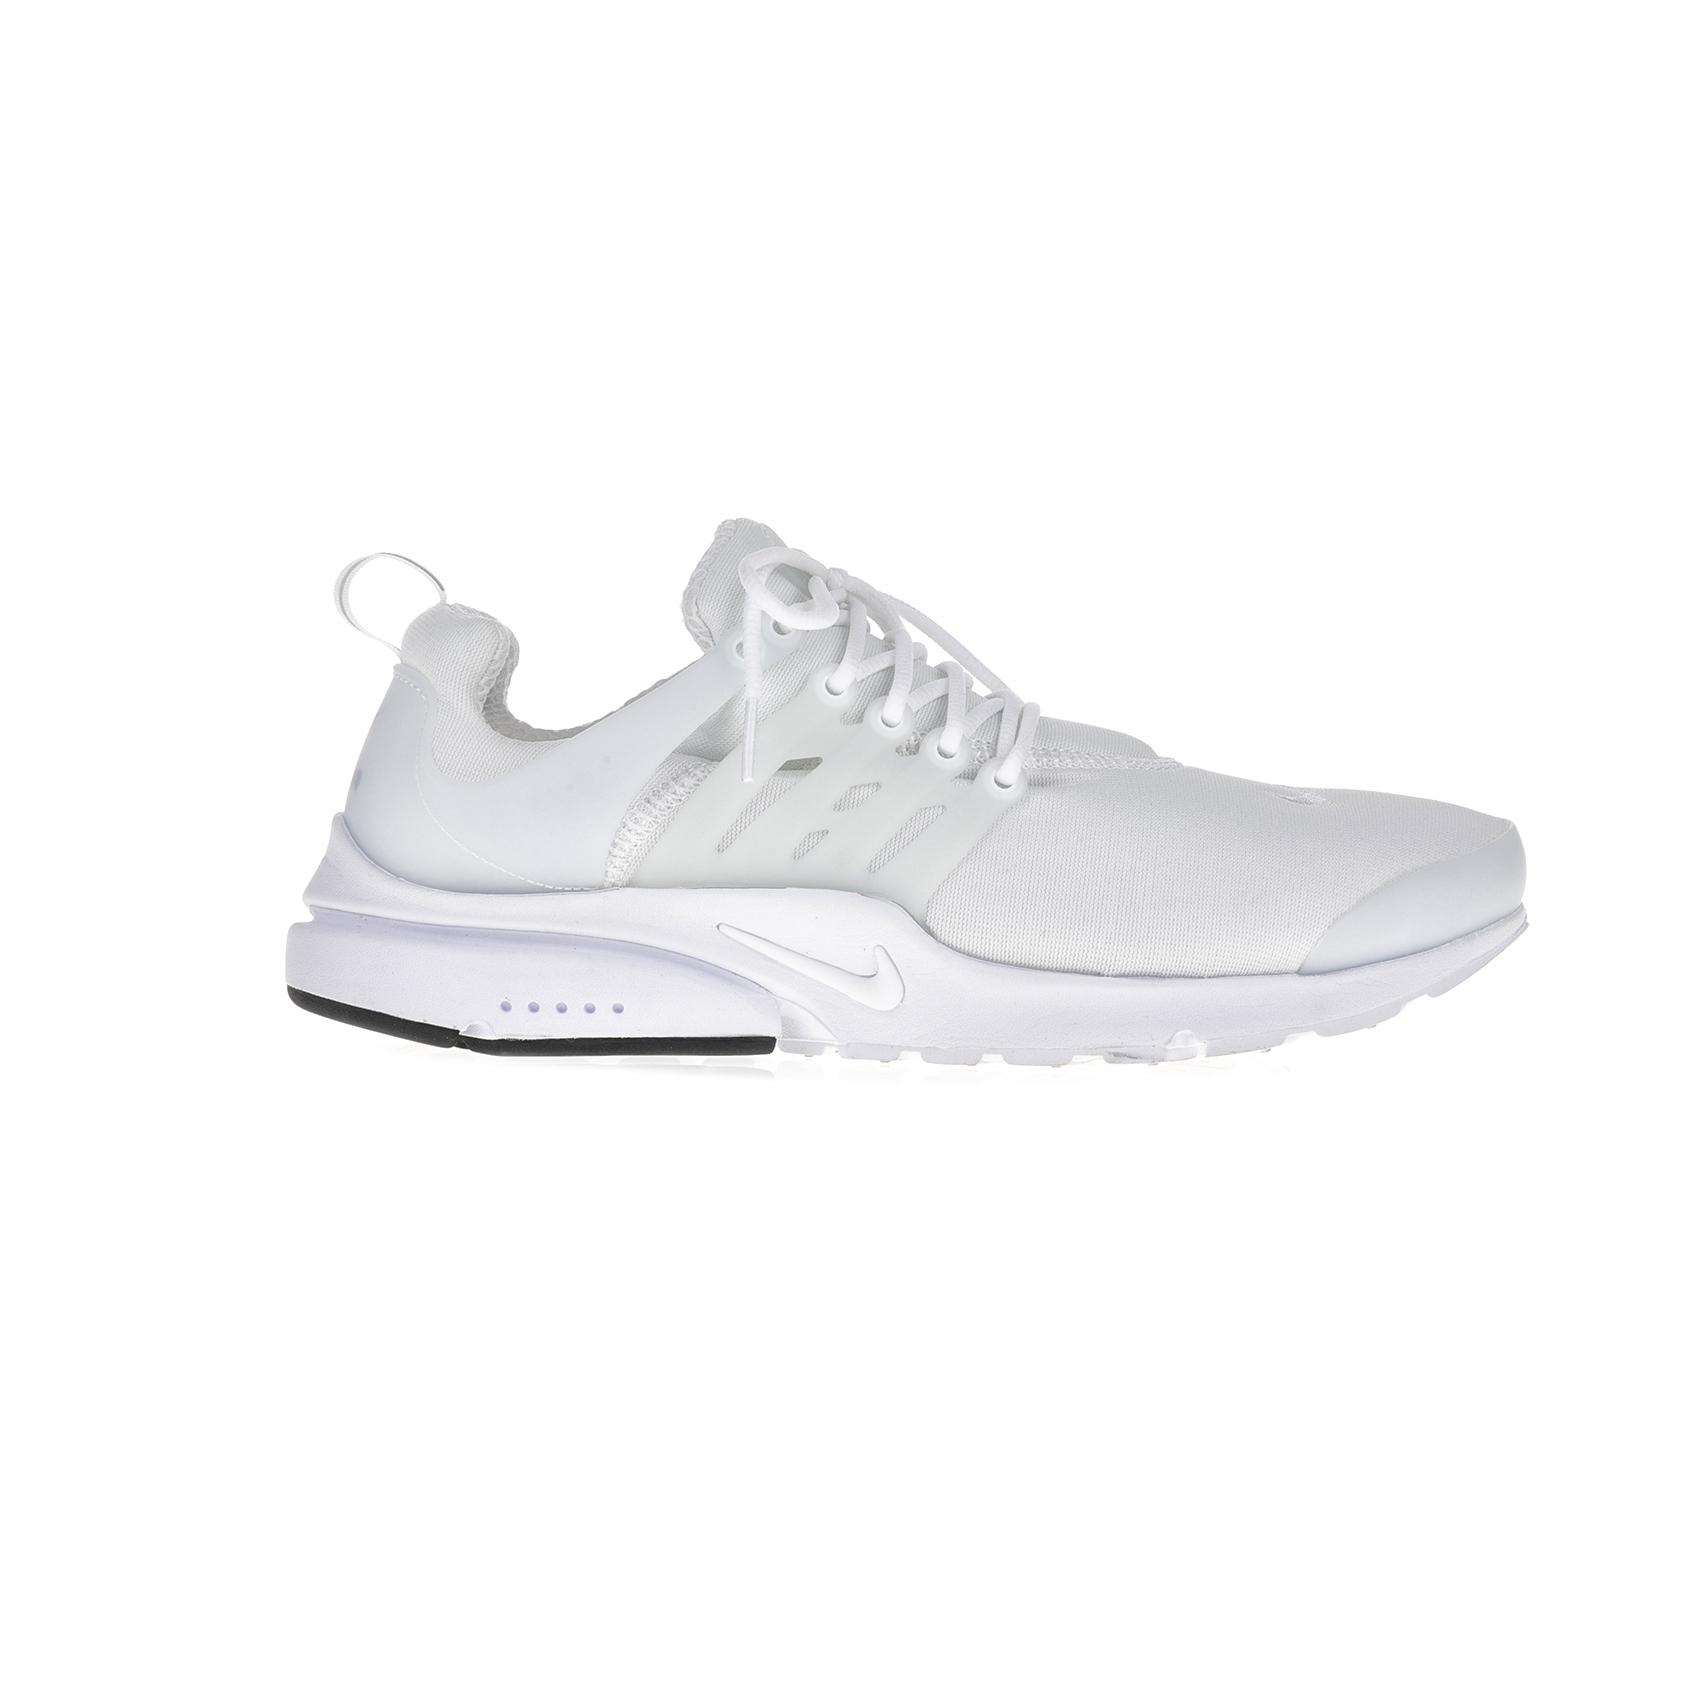 29b802db2 NIKE - Ανδρικά αθλητικά παπούτσια Nike AIR PRESTO ESSENTIAL λευκά